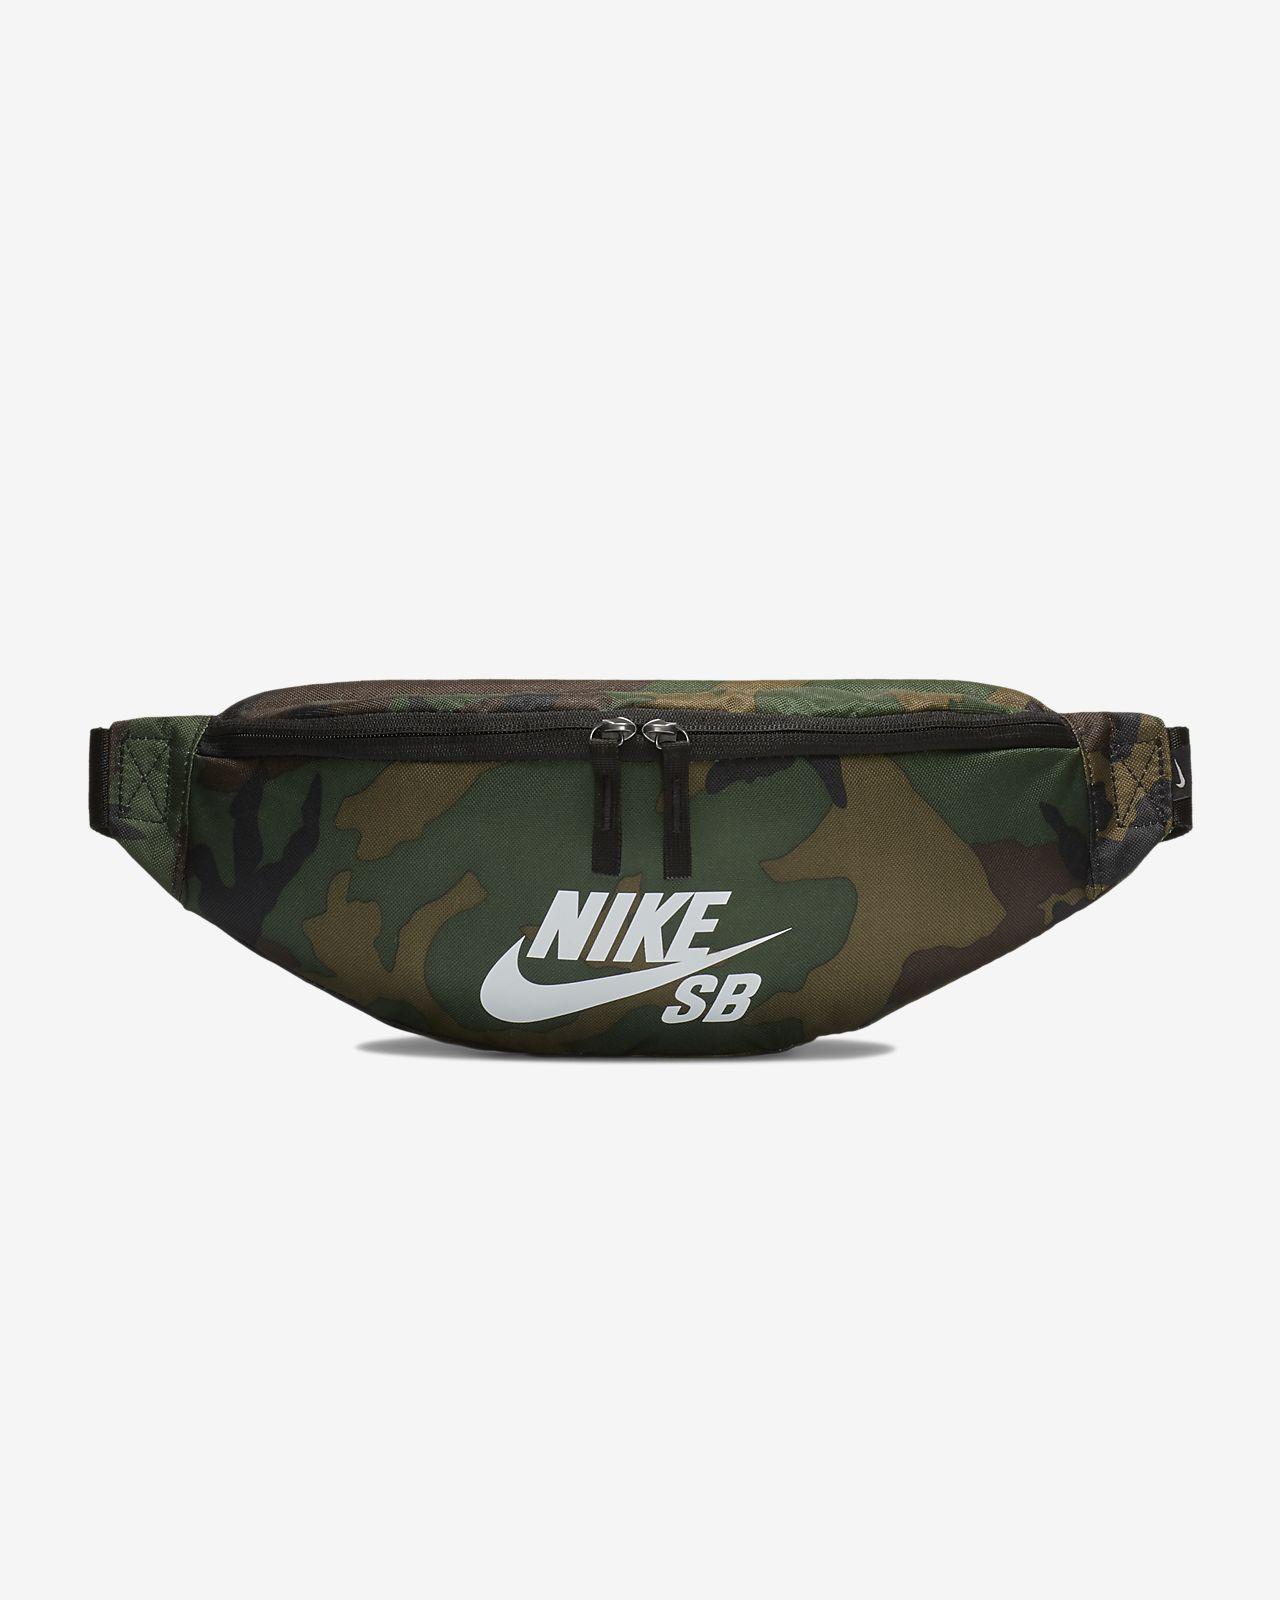 0ae39de6ea ... Τσαντάκι μέσης skateboarding Nike SB Heritage (για μικροαντικείμενα) με  μοτίβο